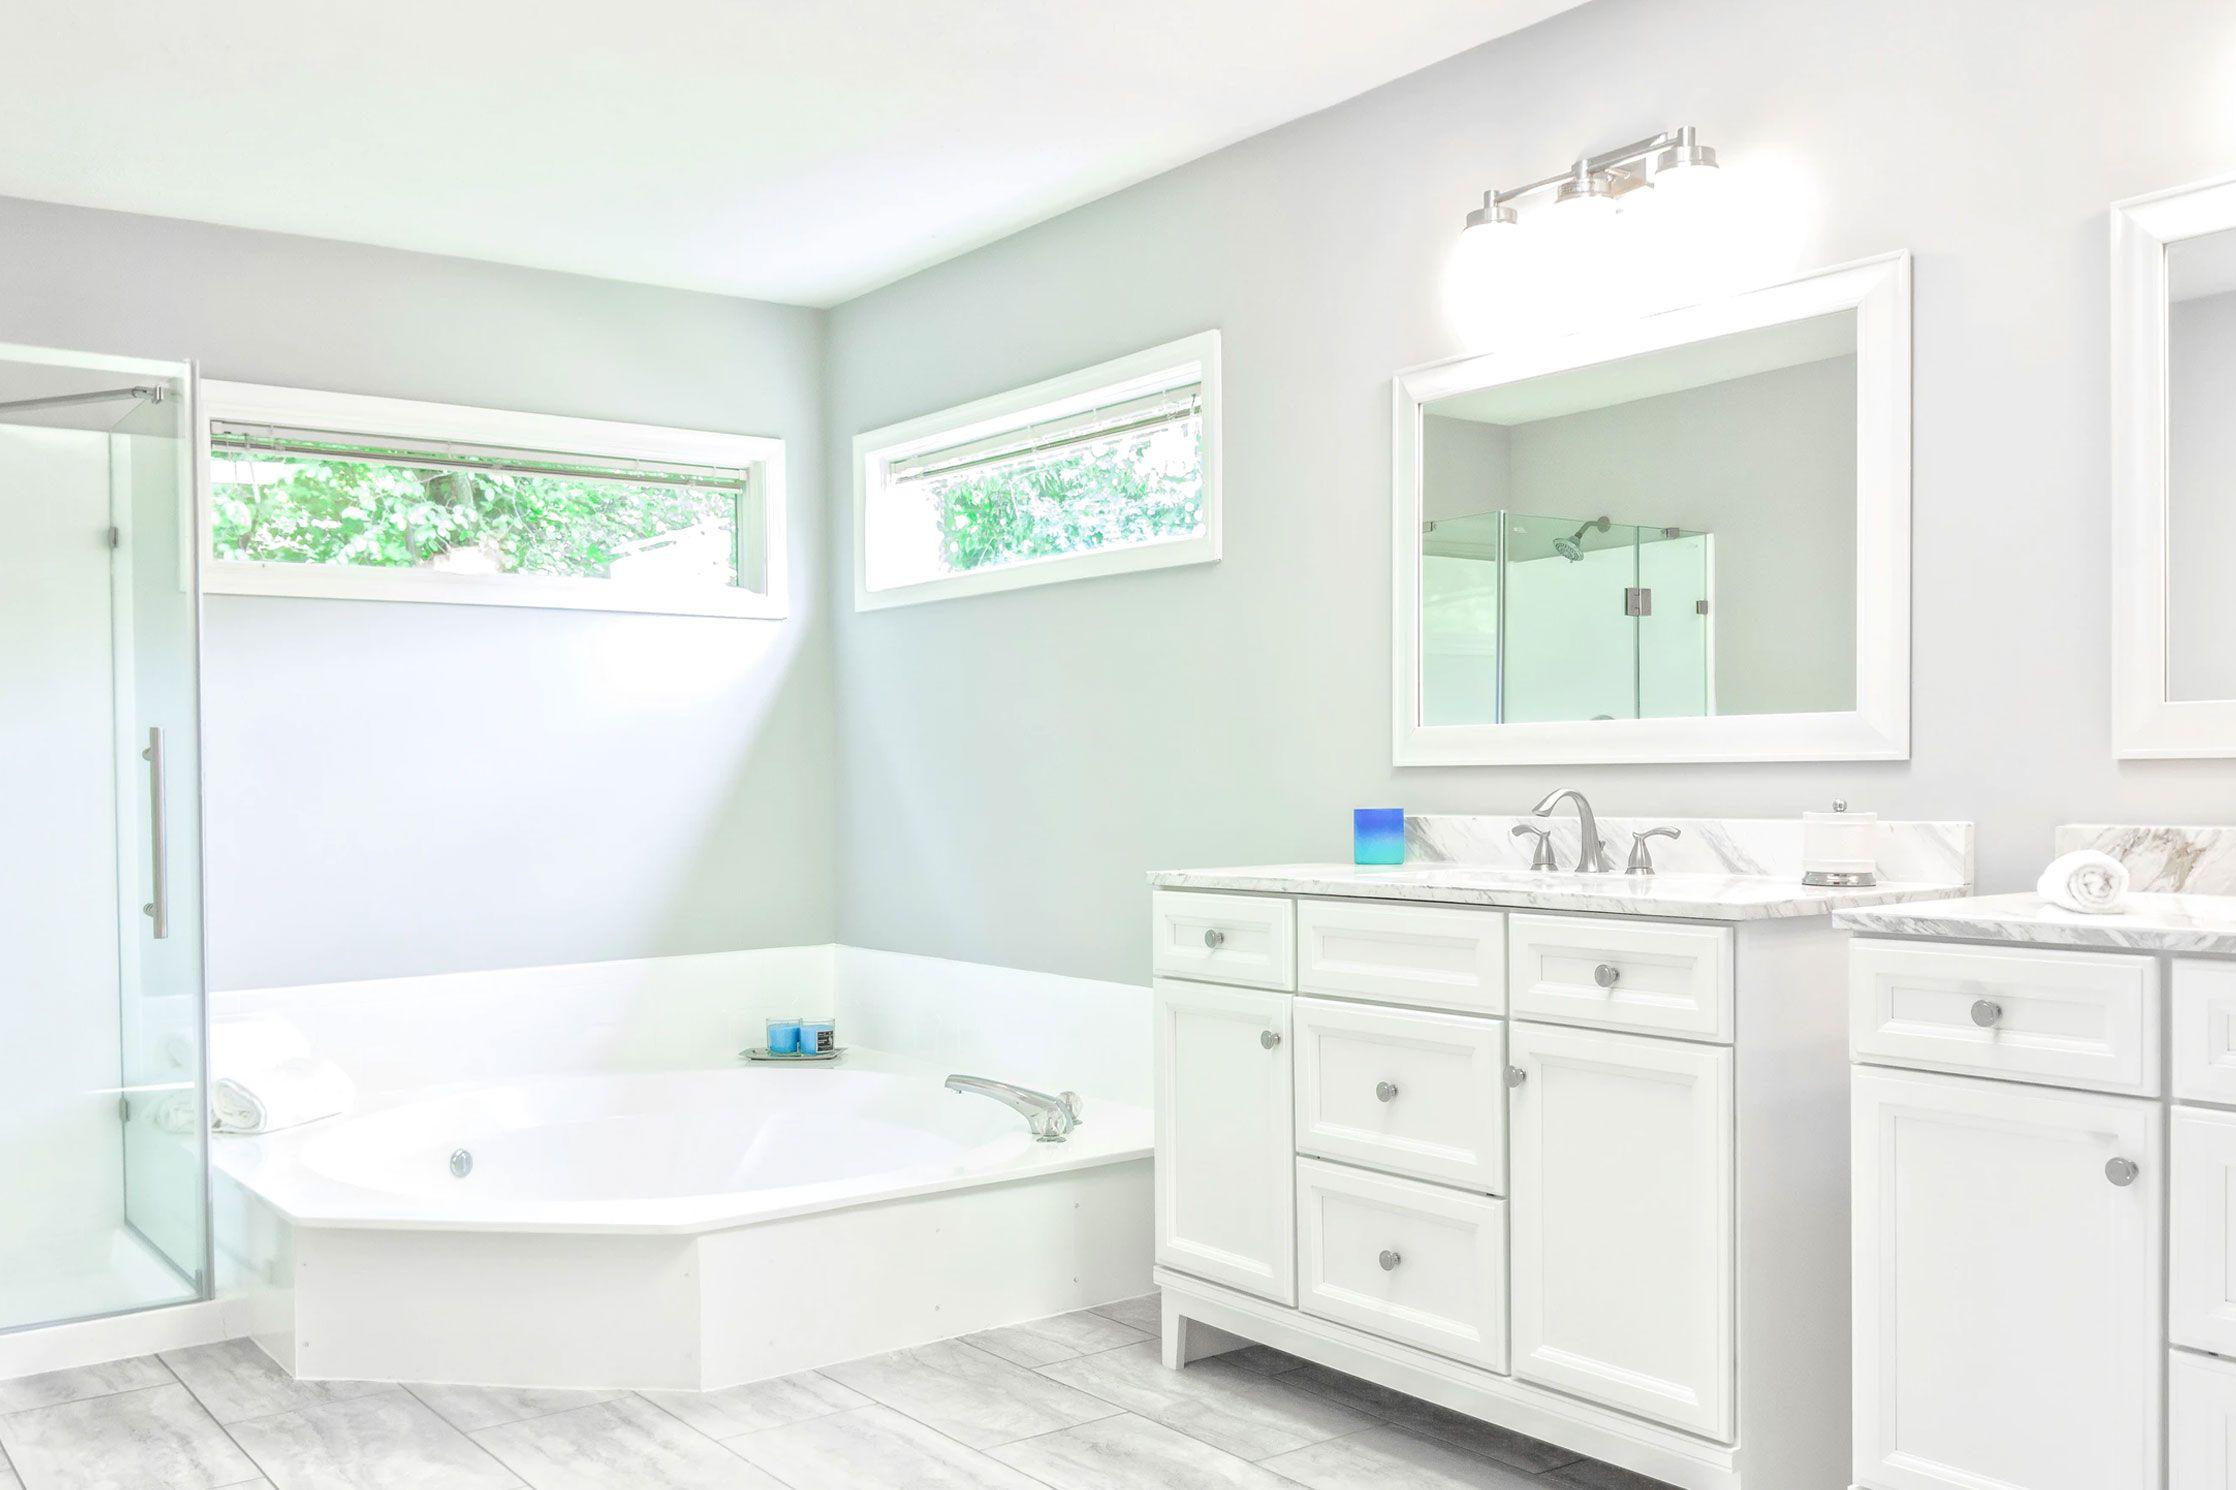 work-familybathroom-featured